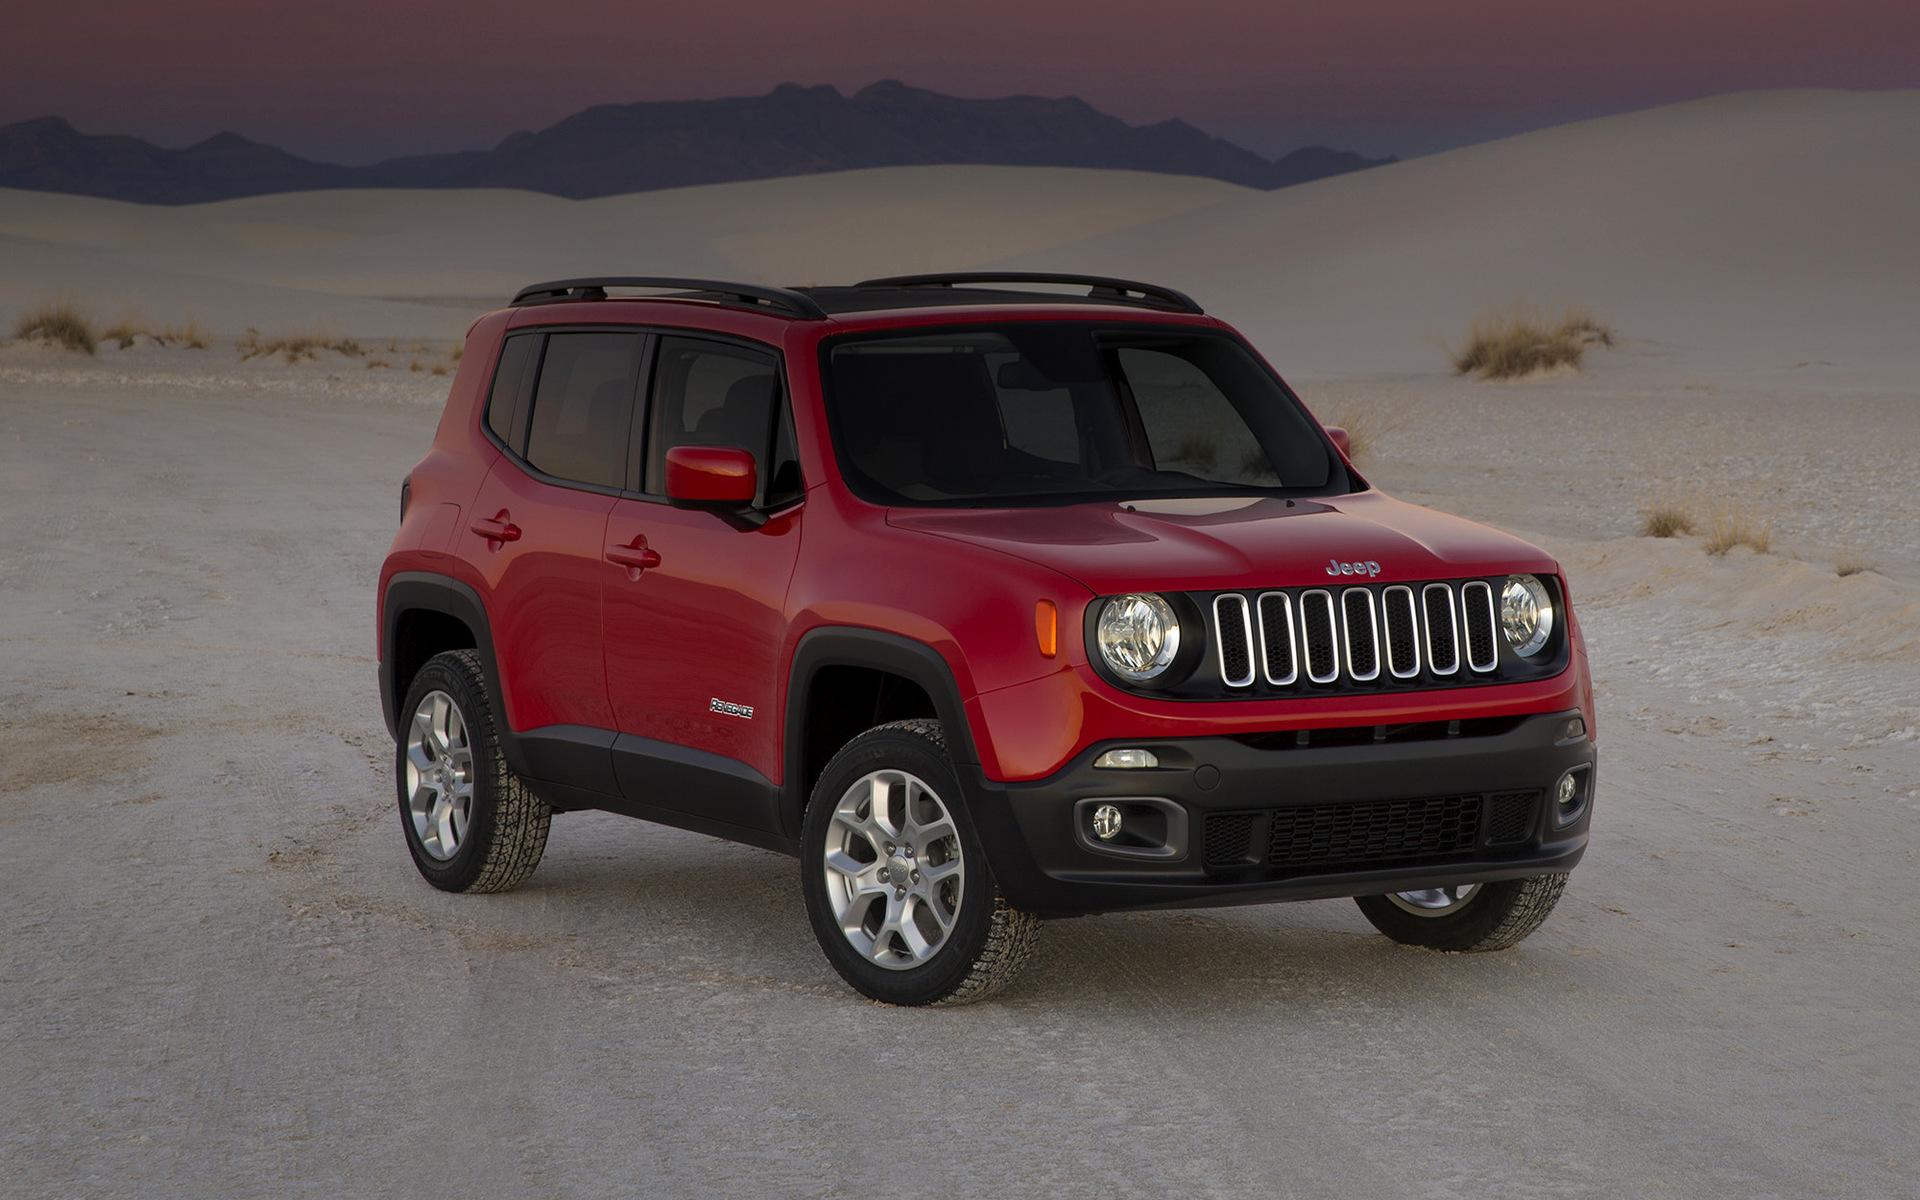 trailhawk autoevolution review latitude renegade reviews jeep